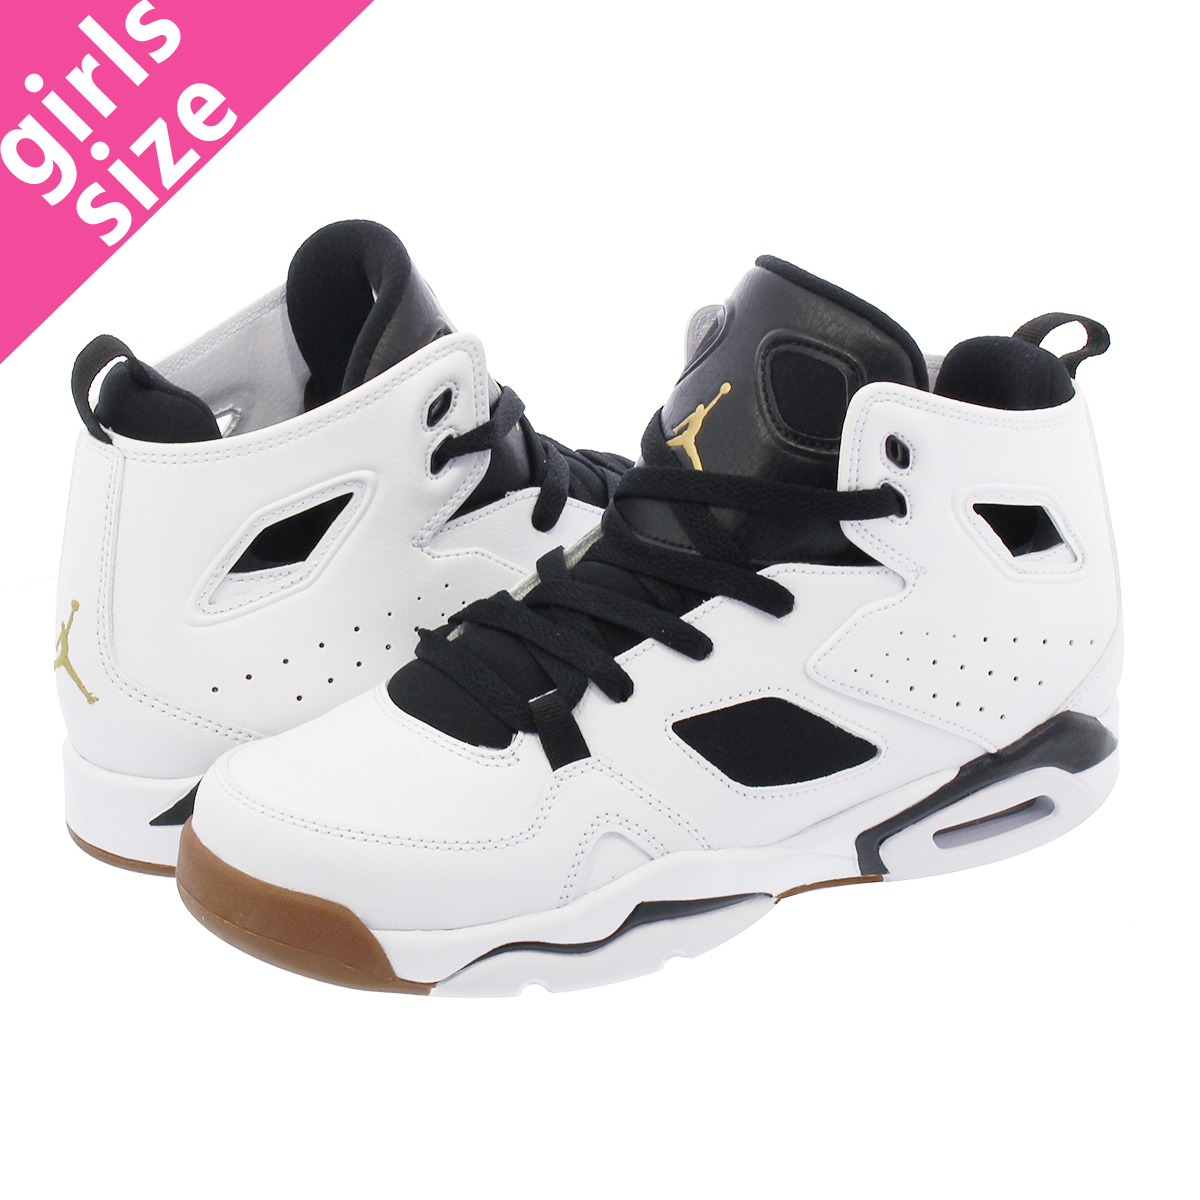 NIKE JORDAN FLIGHT CLUB 91 GG Nike Jordan flight club 91 GG WHITE BLACK GOLD  555 40f0f4a36